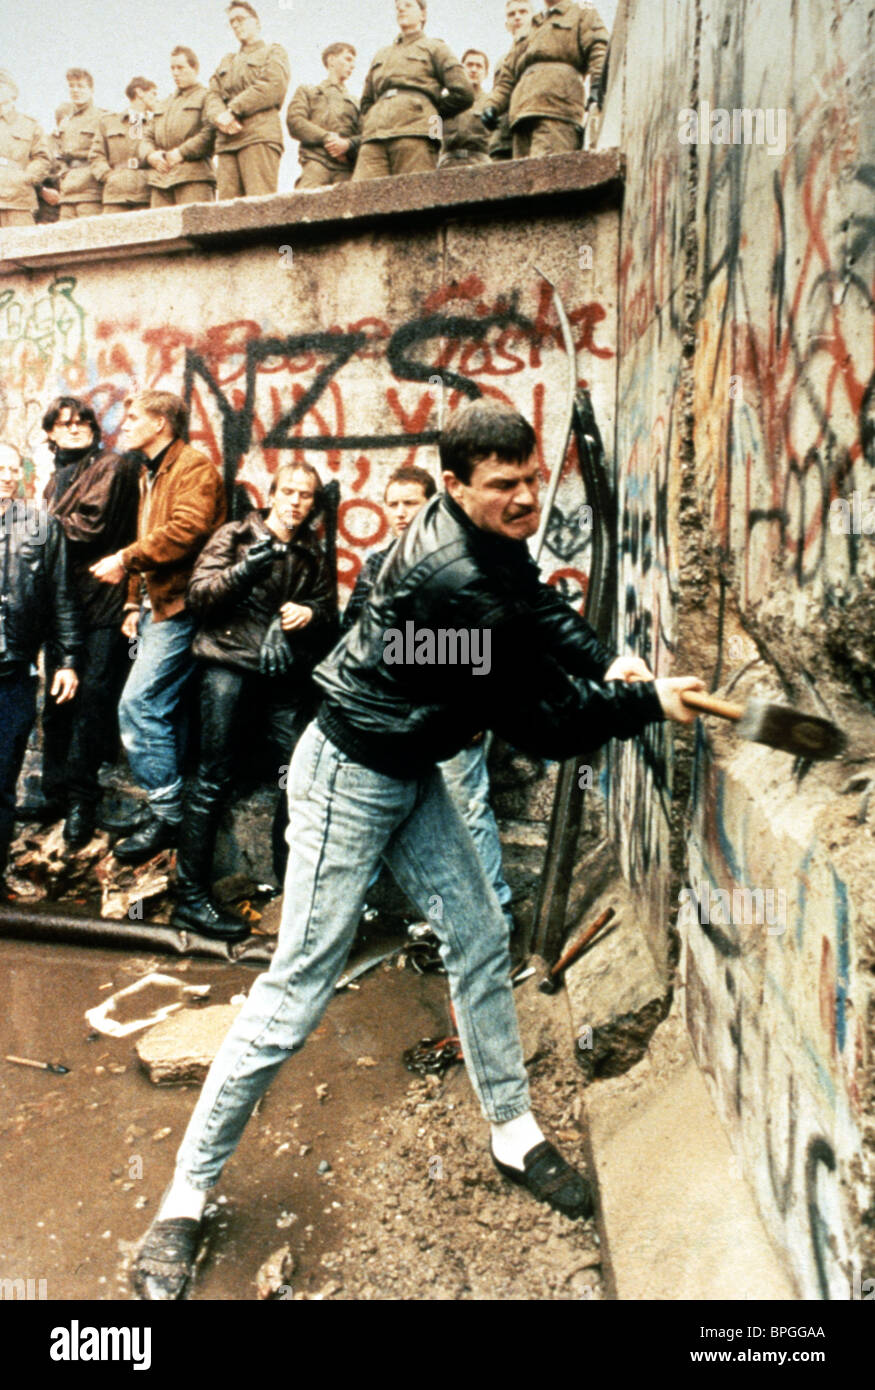 Muro de Berlín BAJANDO Guerra Fría (1998) Imagen De Stock